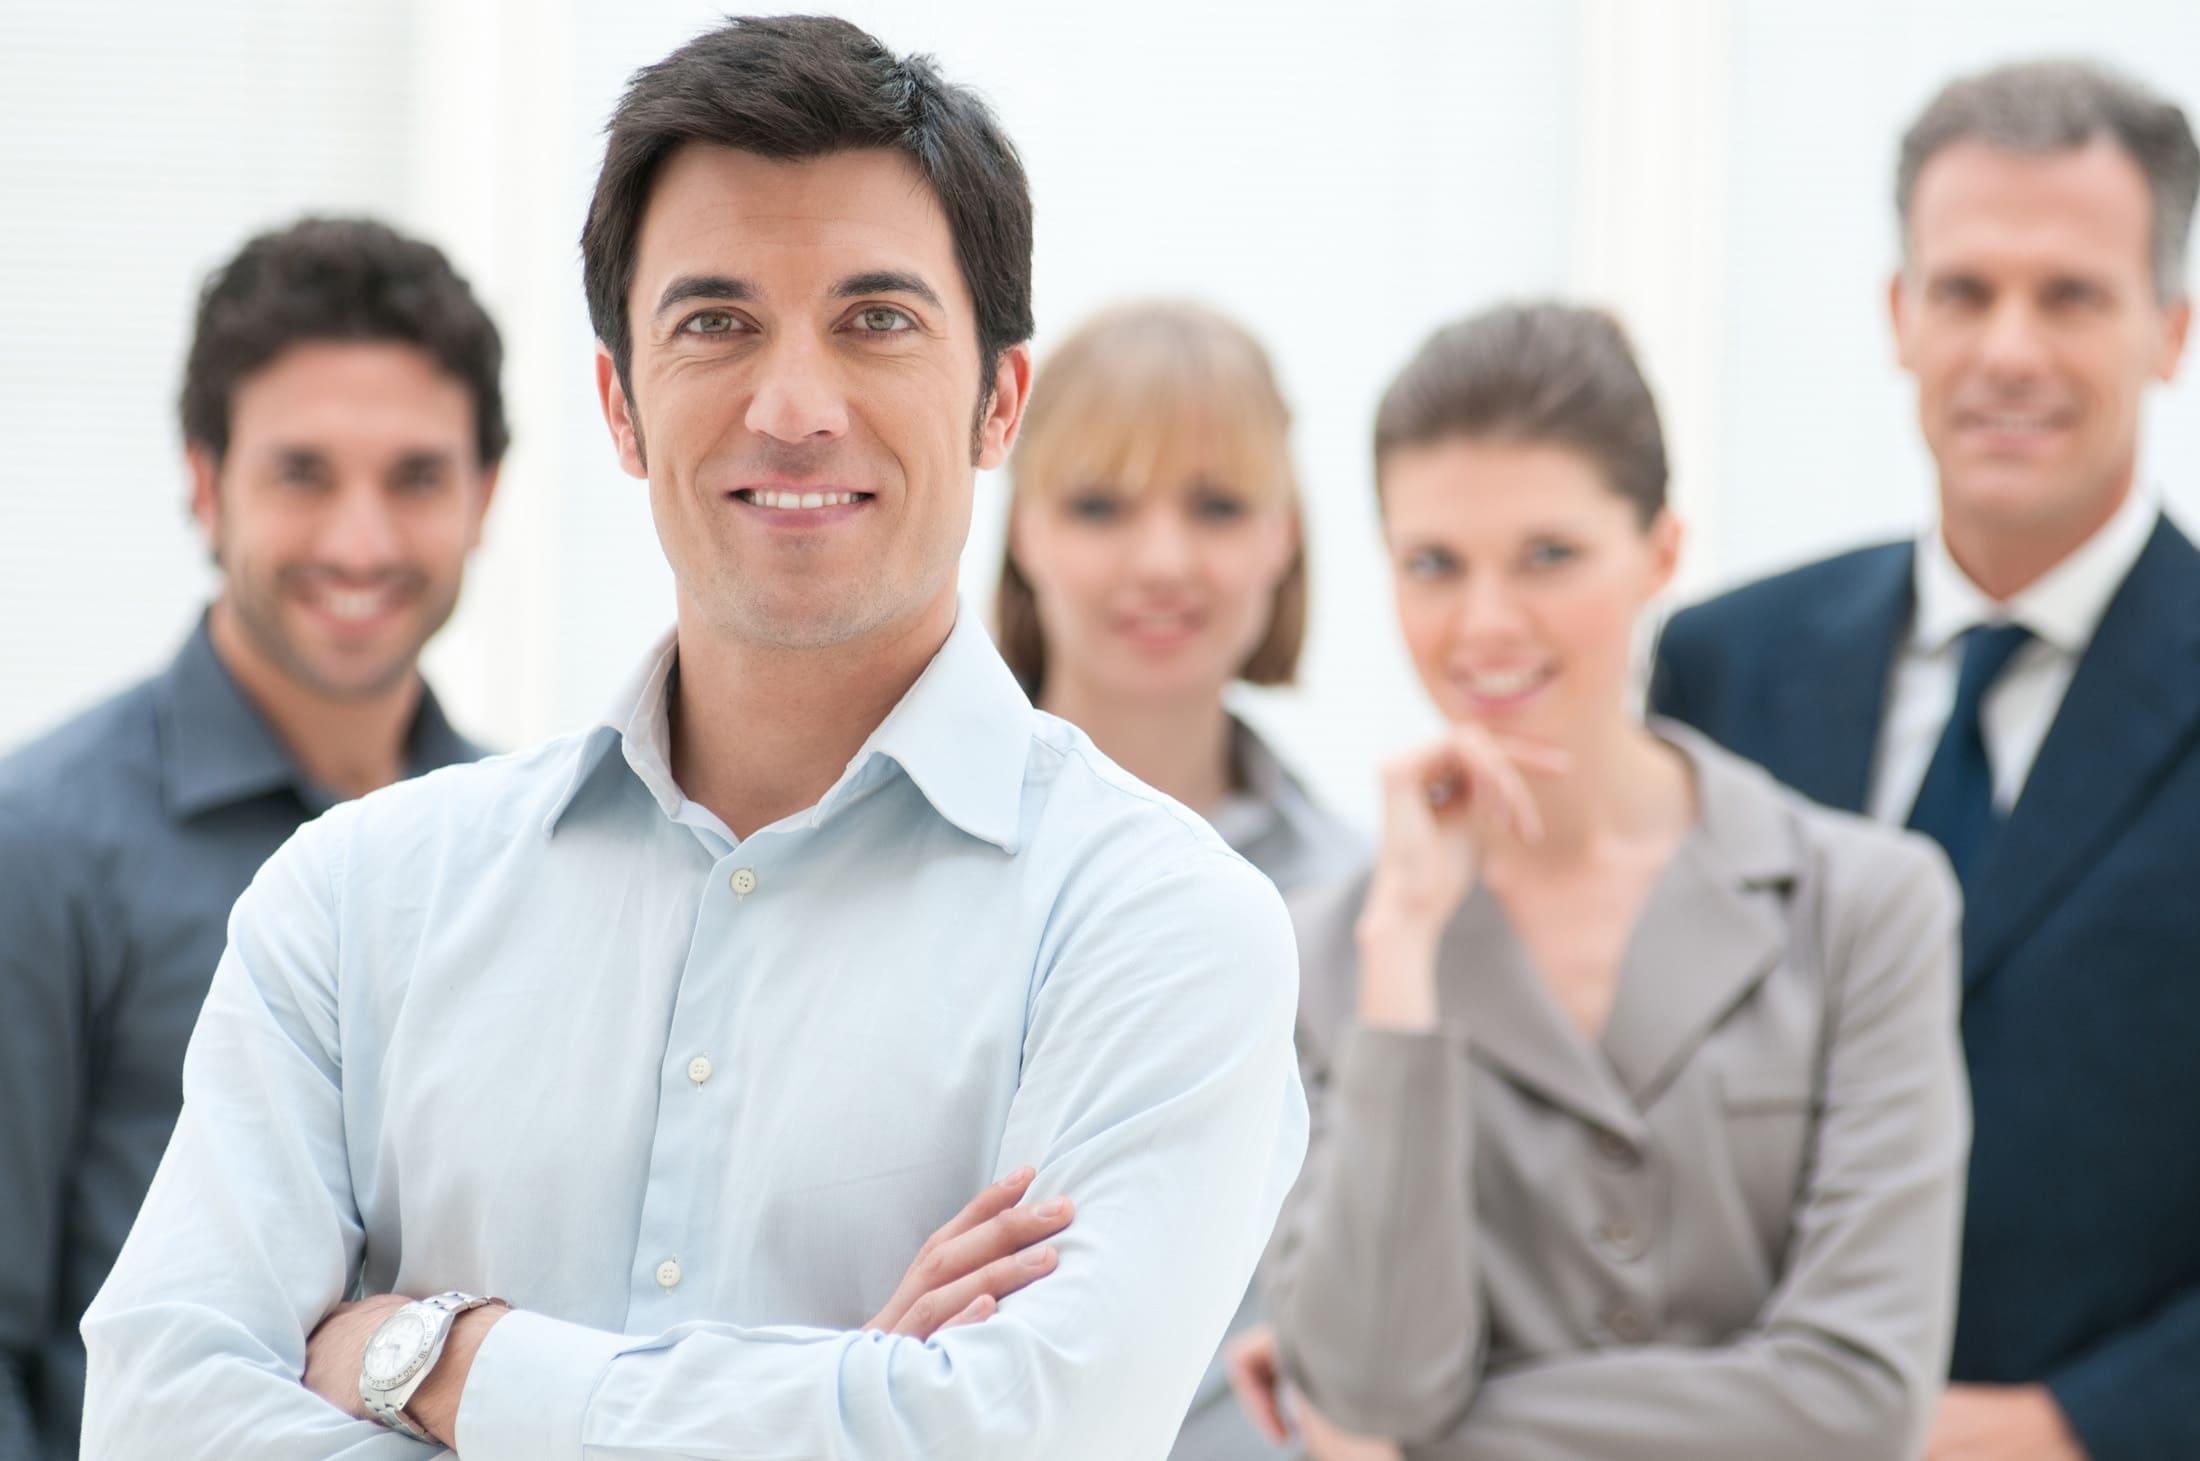 Detalhes - Seguro de Vida Empresarial Contrate Fácil Icatu